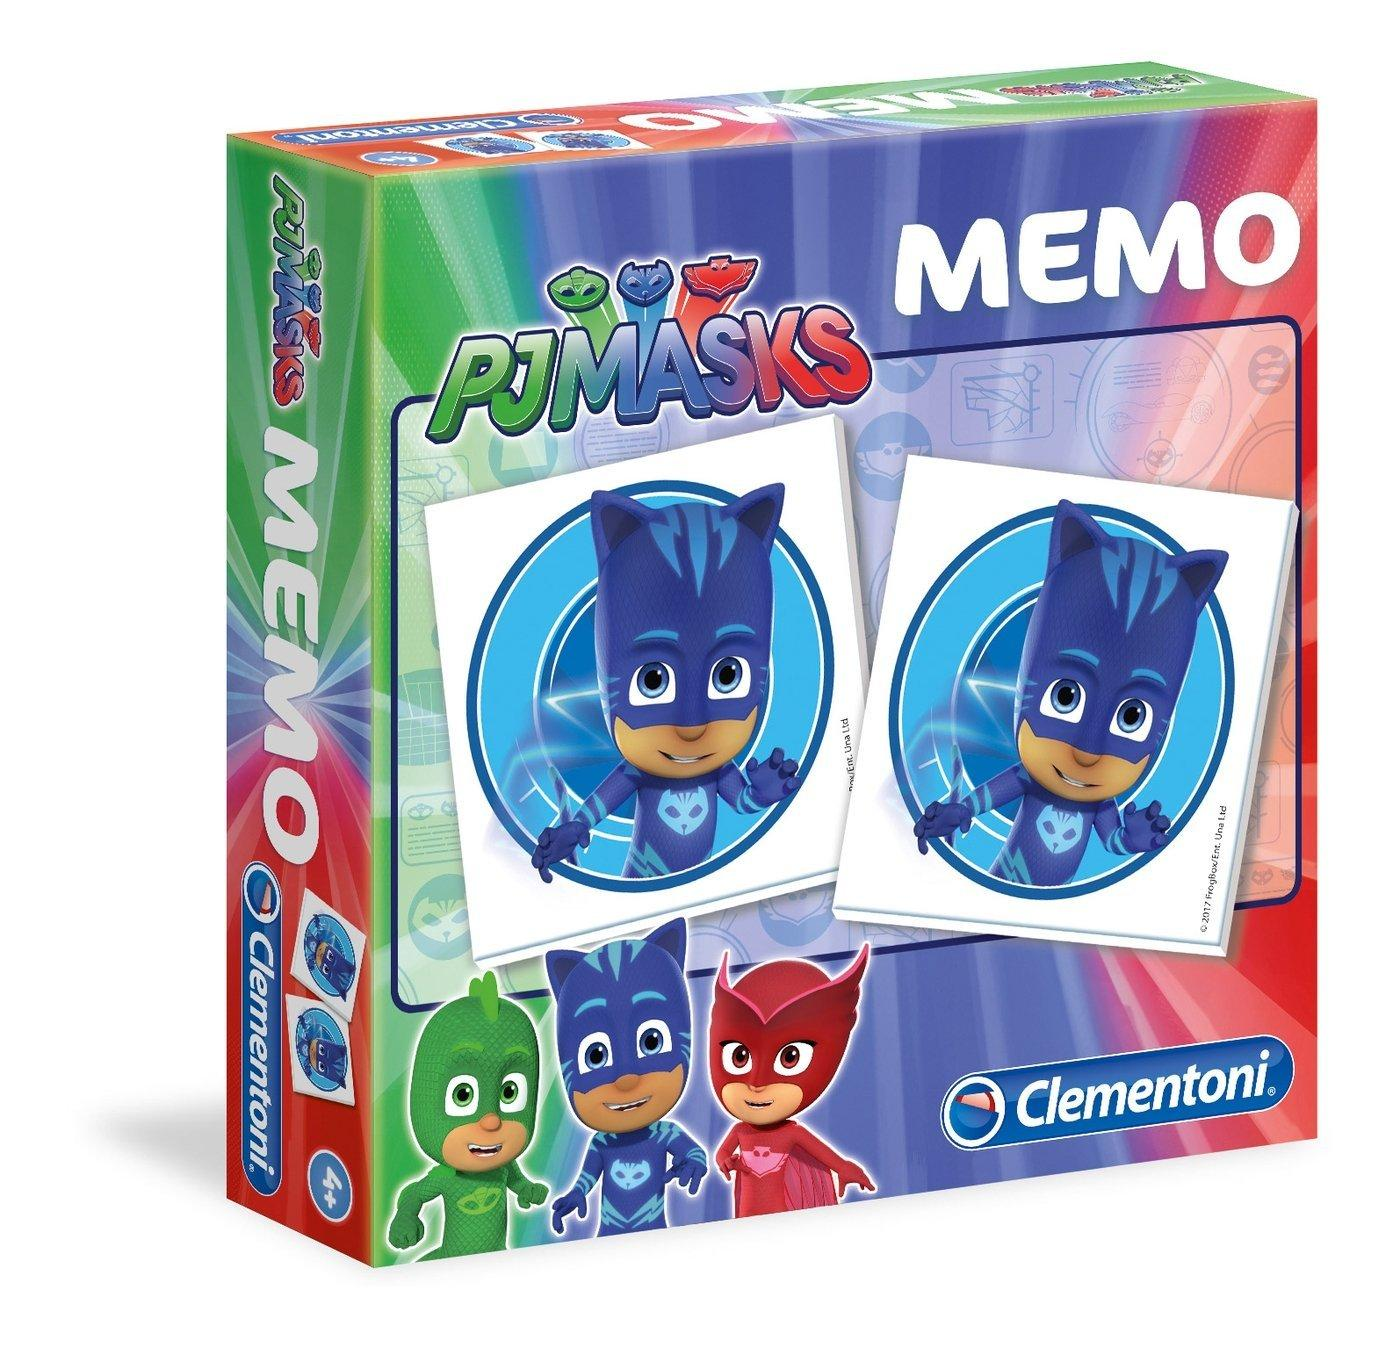 MEMO GAME PJ MASKS 18012 CLEMENTONI